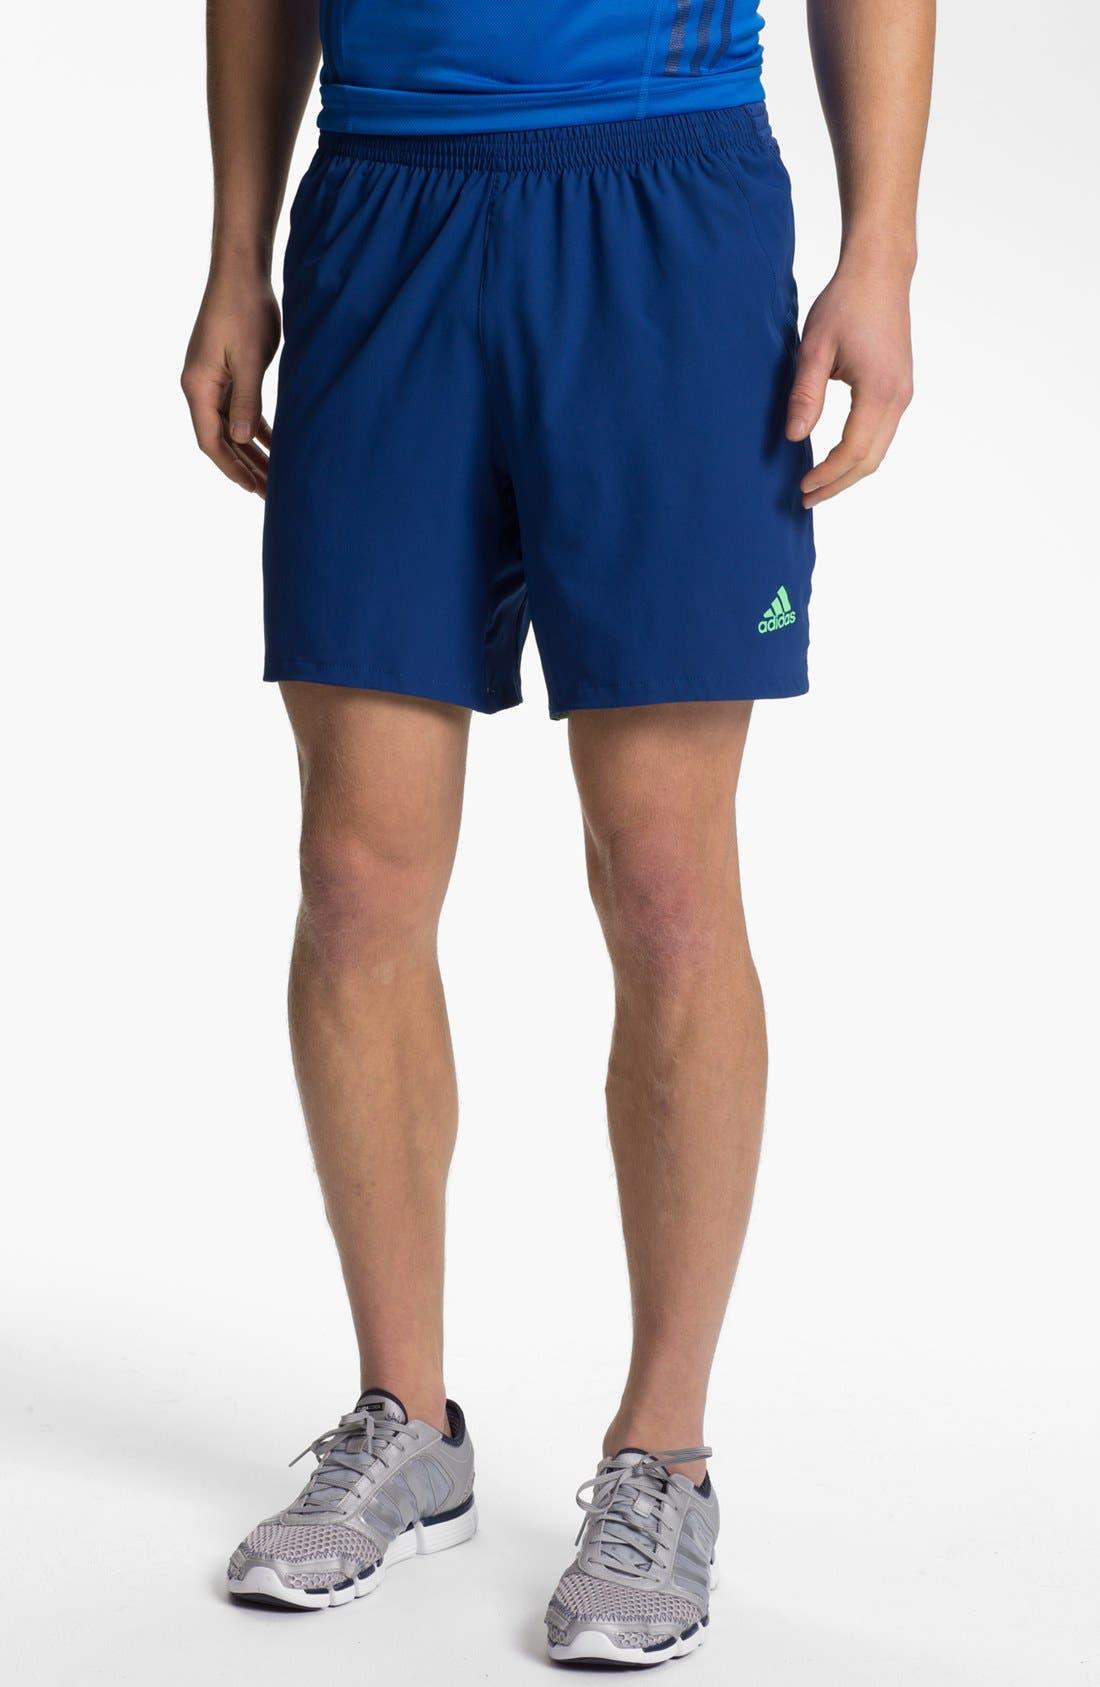 Alternate Image 1 Selected - adidas 'Supernova' Shorts